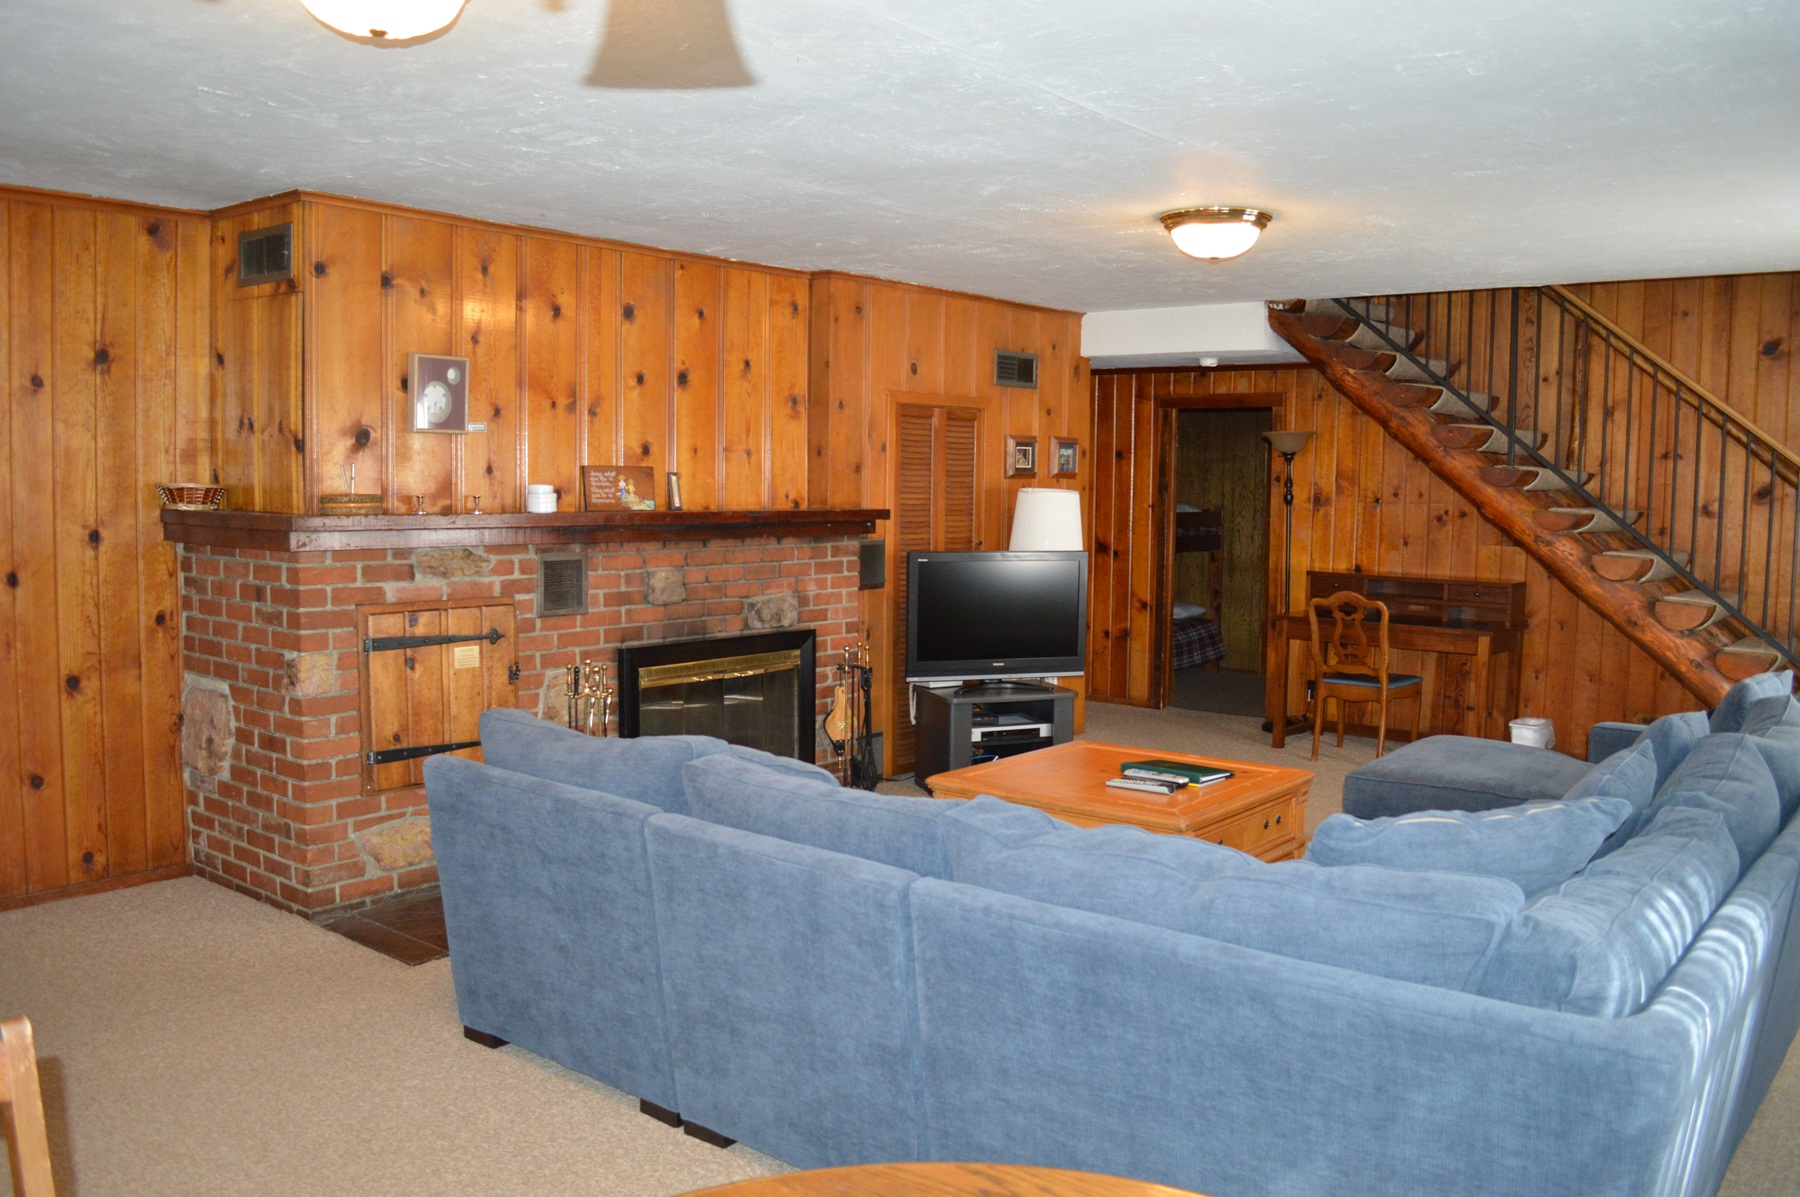 Spacious living room with big L shape sofa for a big family gath